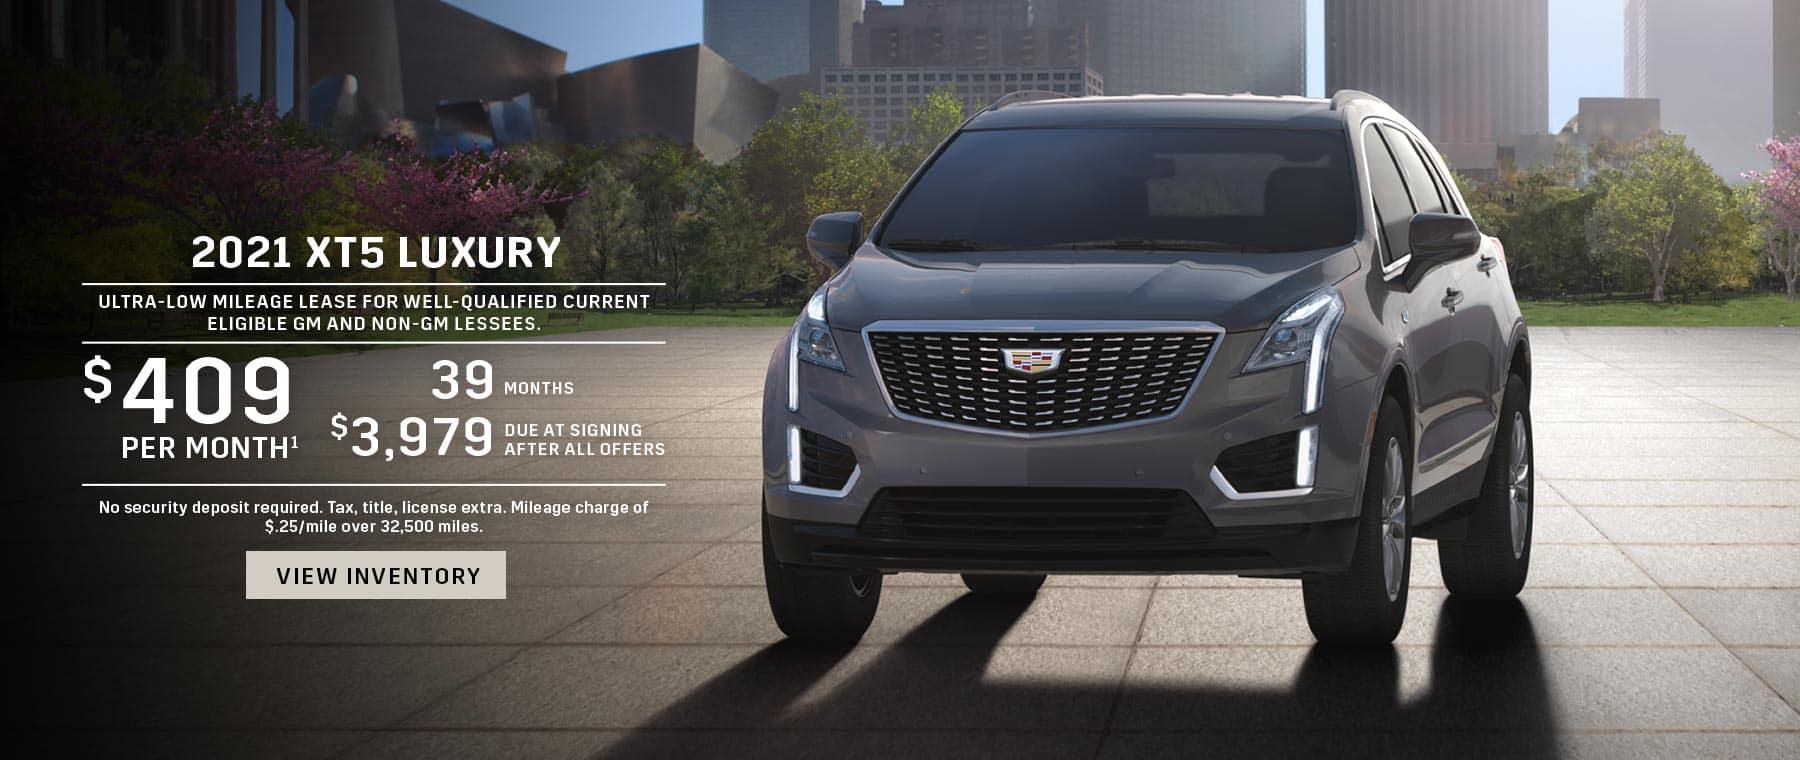 2021 Cadillac XT5 Lease offer